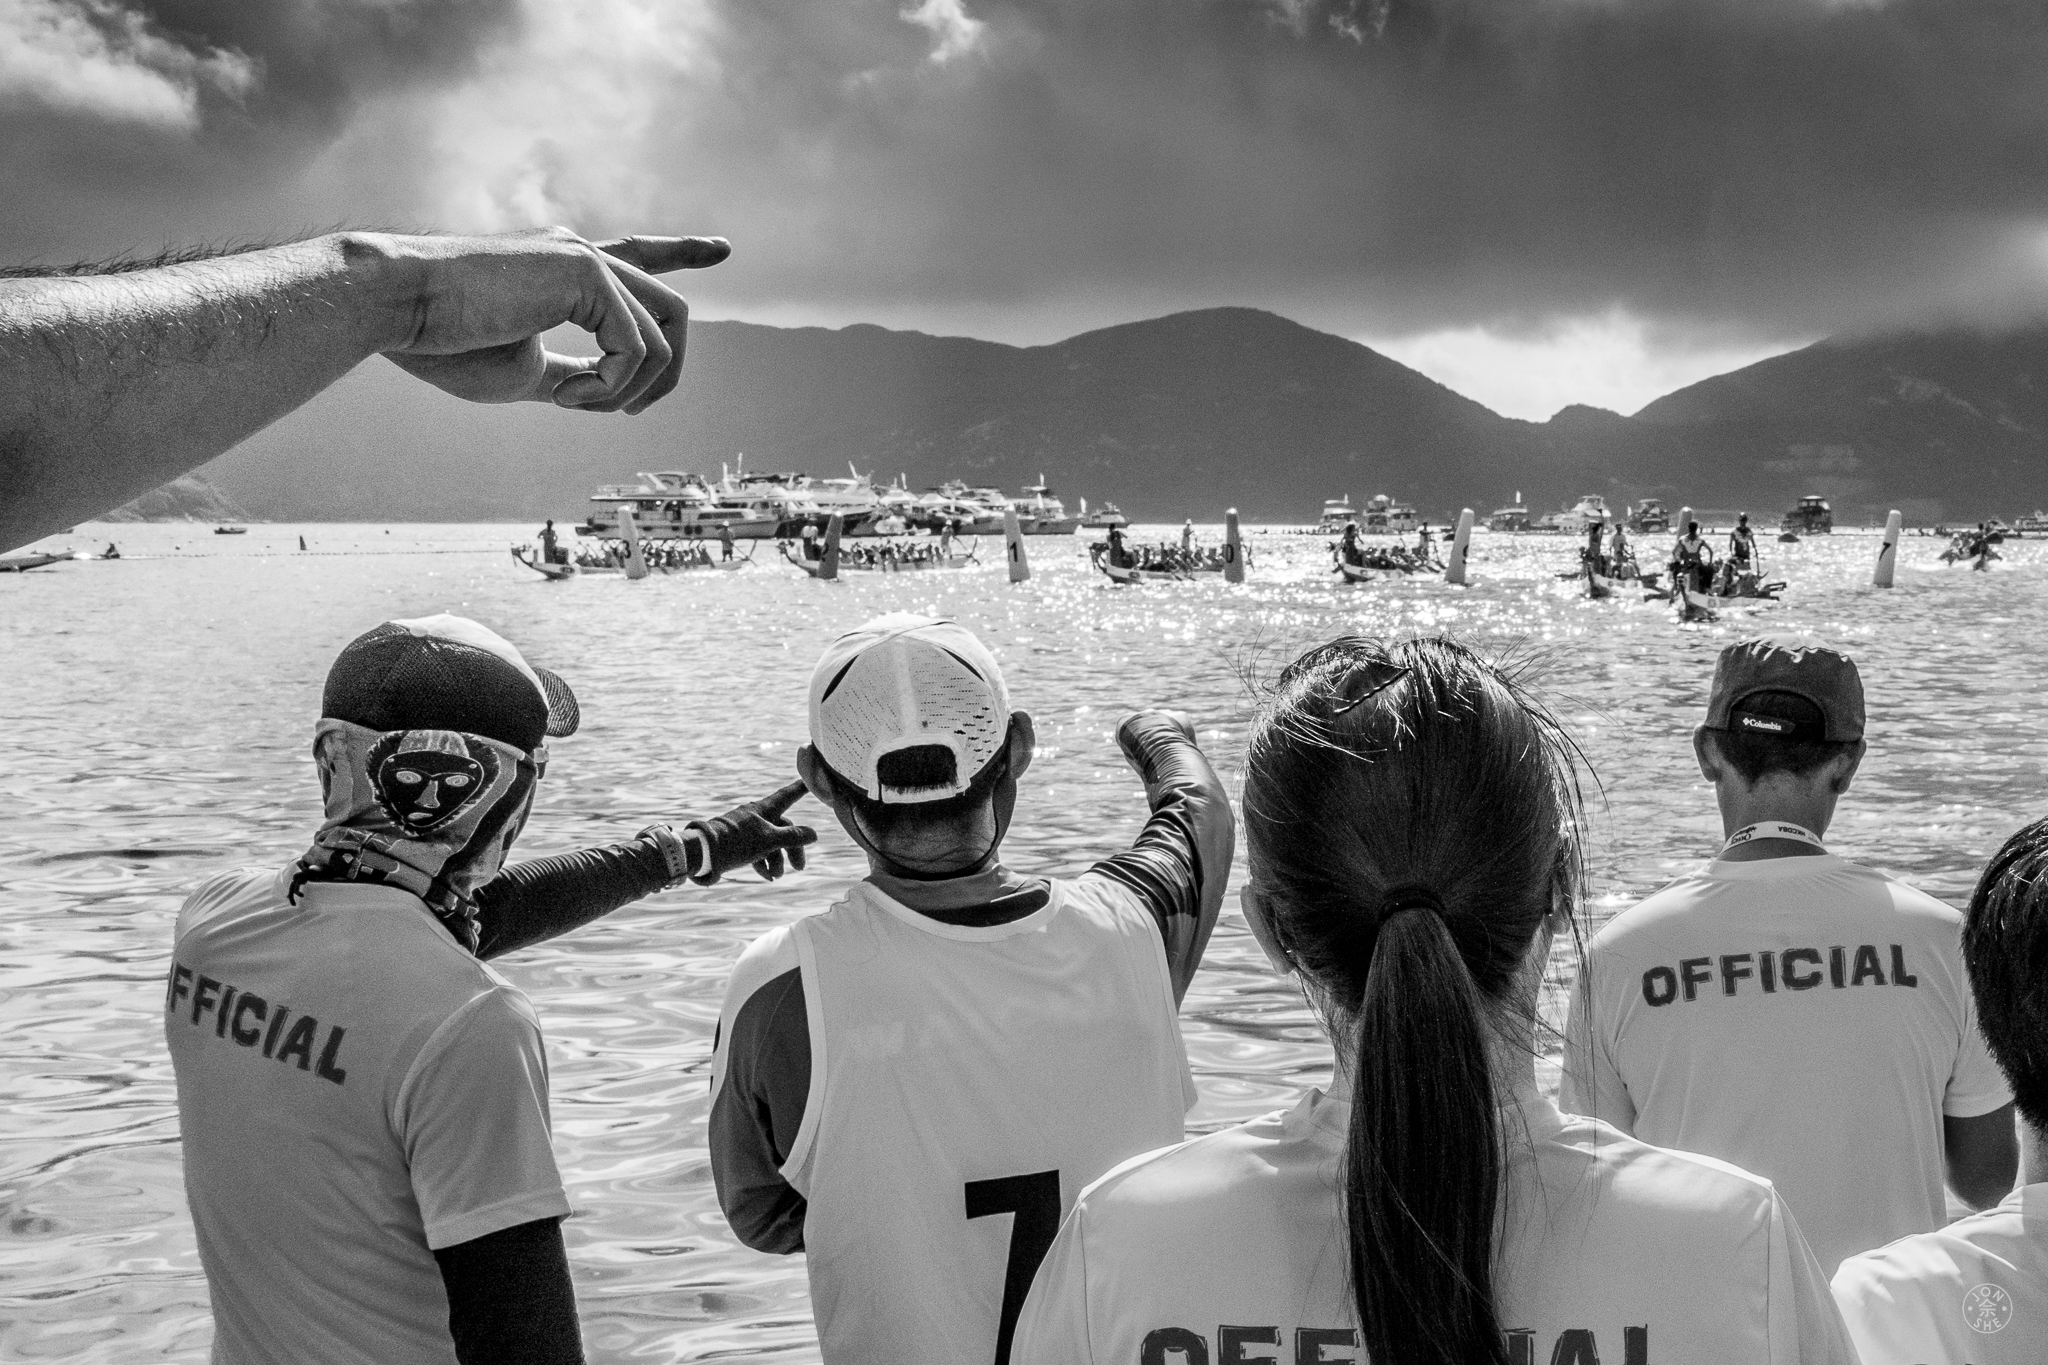 """Thunderstorm on the Horizon"".  Dragonboat Festival Race participants preparing for rain on Stanley Beach. Hong Kong, China. June, 2016. © Jon She.Leica Q (Typ 116), Leica Summilux-M 28mm ASPH."